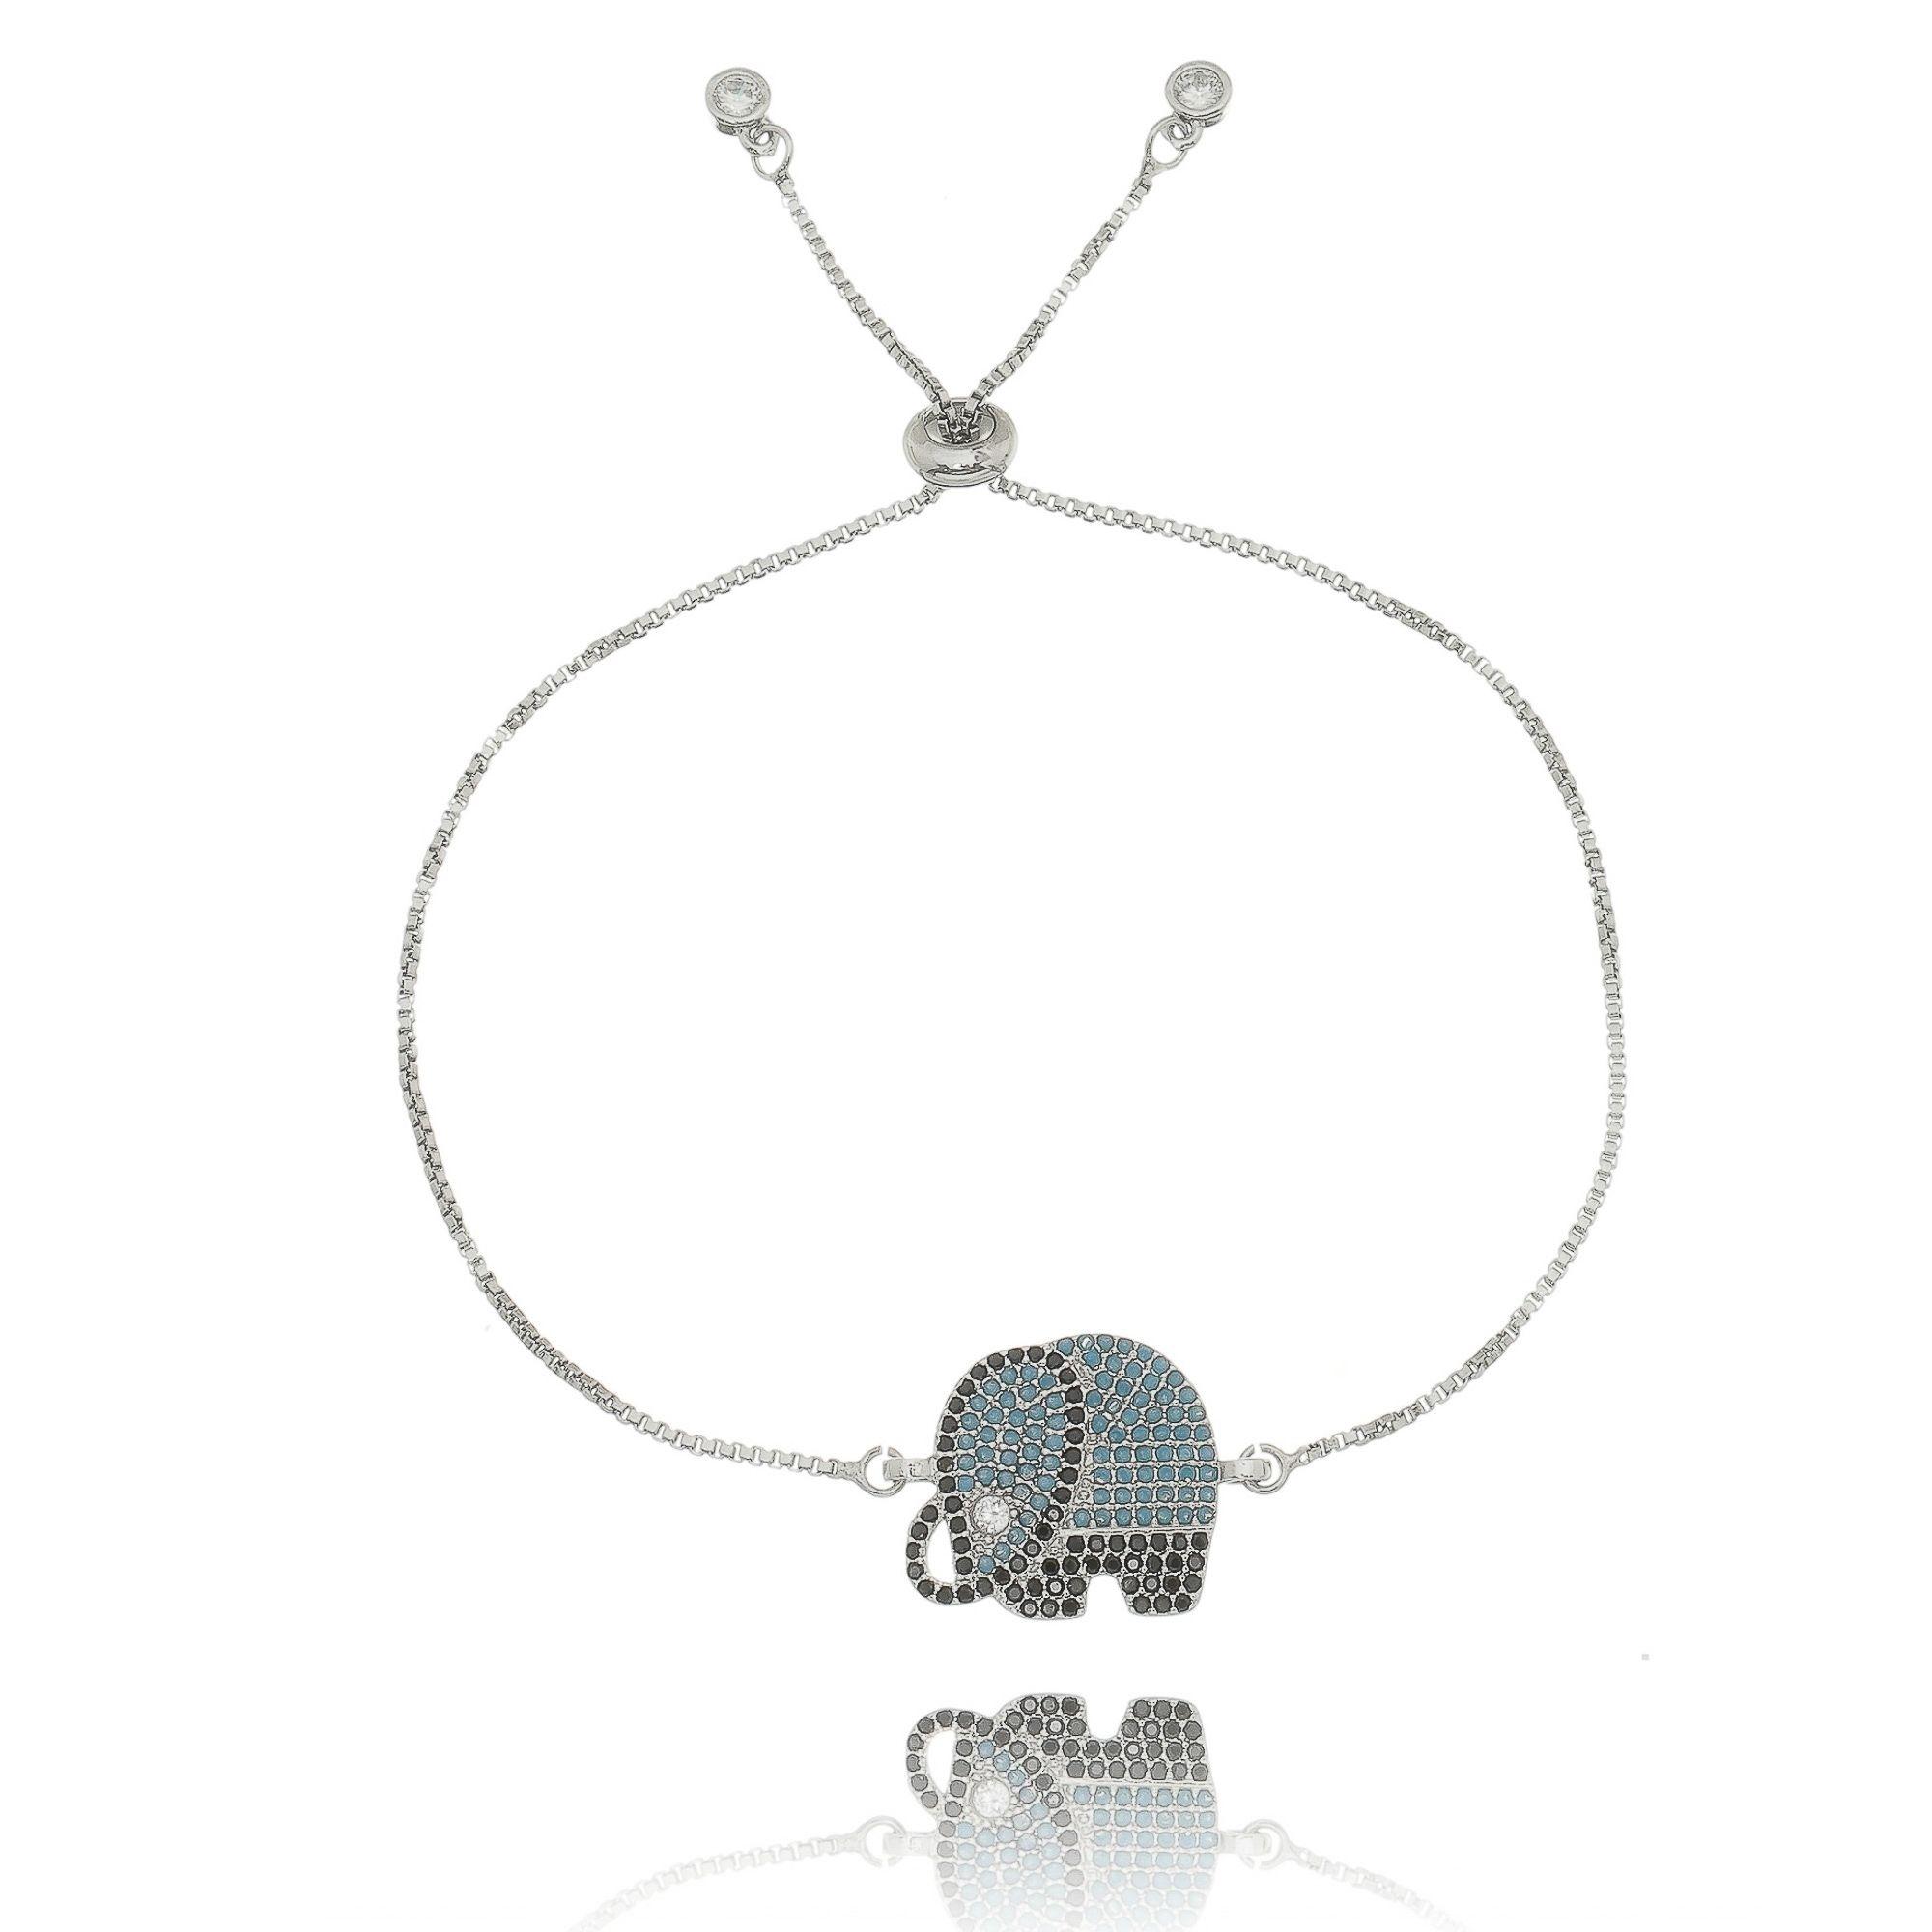 Pulseira com Pingente Elefante Sorte Zircônias Preta, Turquesa e Cristal Semijoia Ródio Branco  - Soloyou